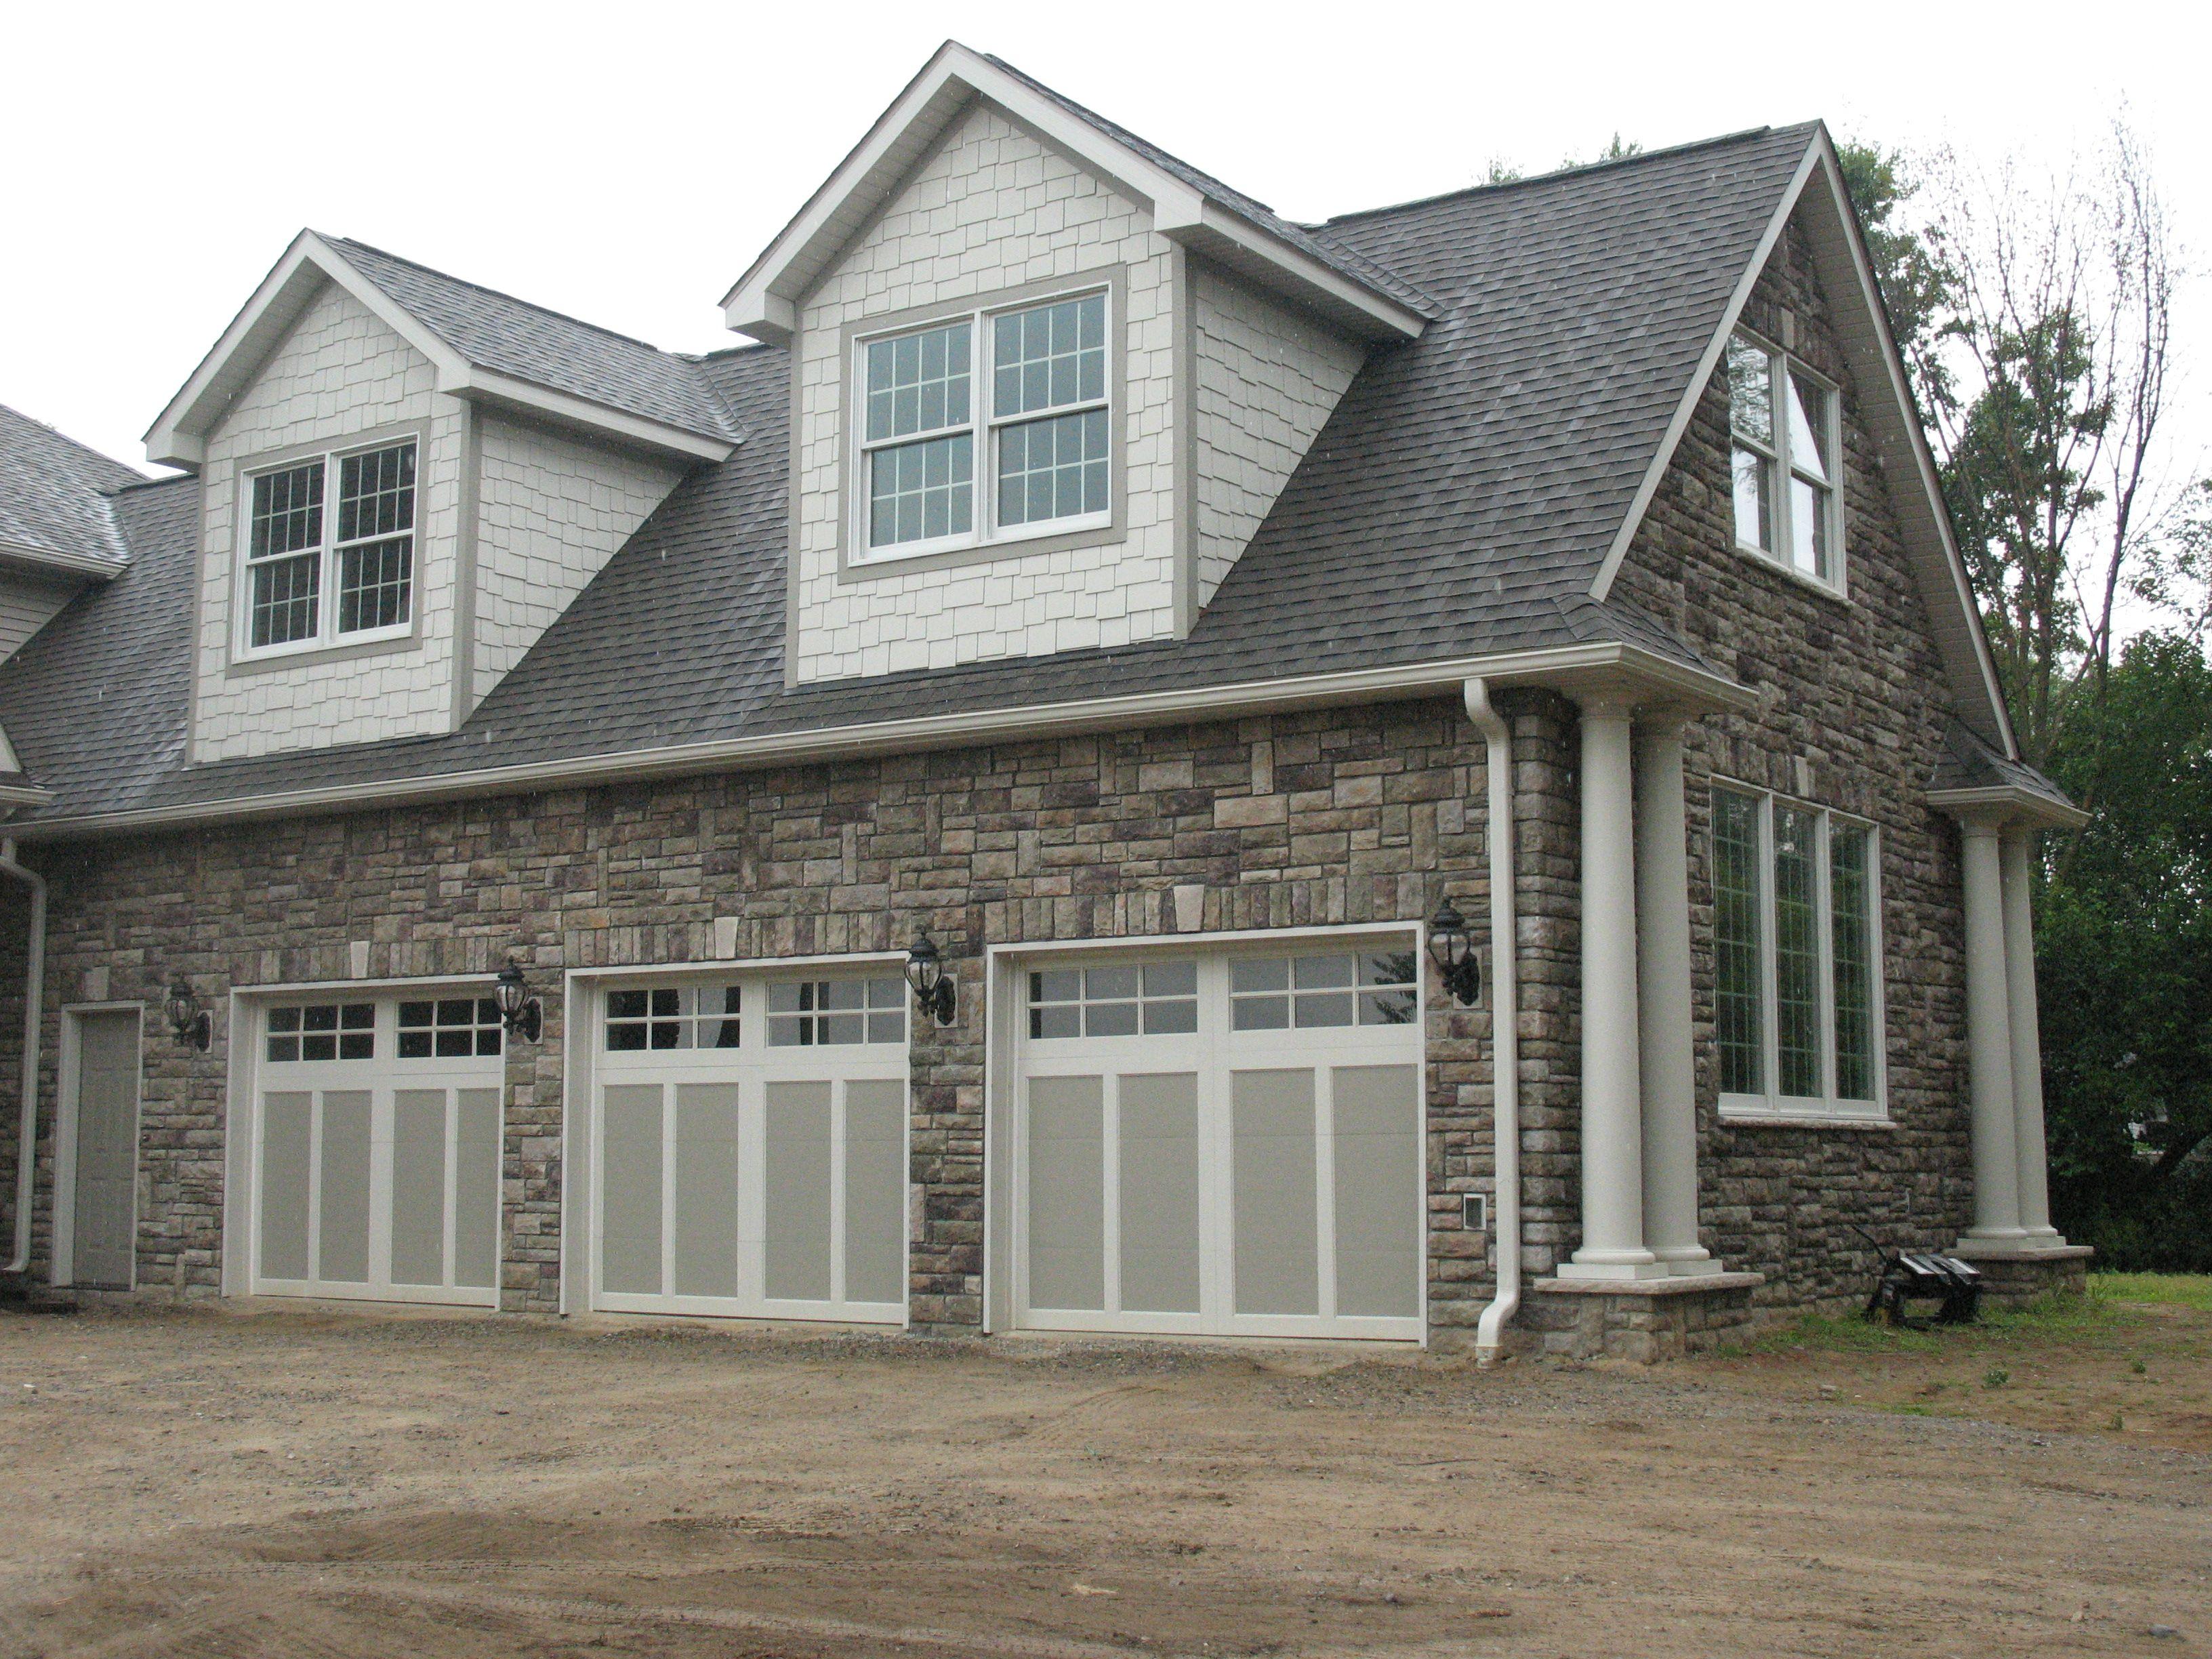 Garage Done In Bucks County Limestone From Boral Cultured Stone